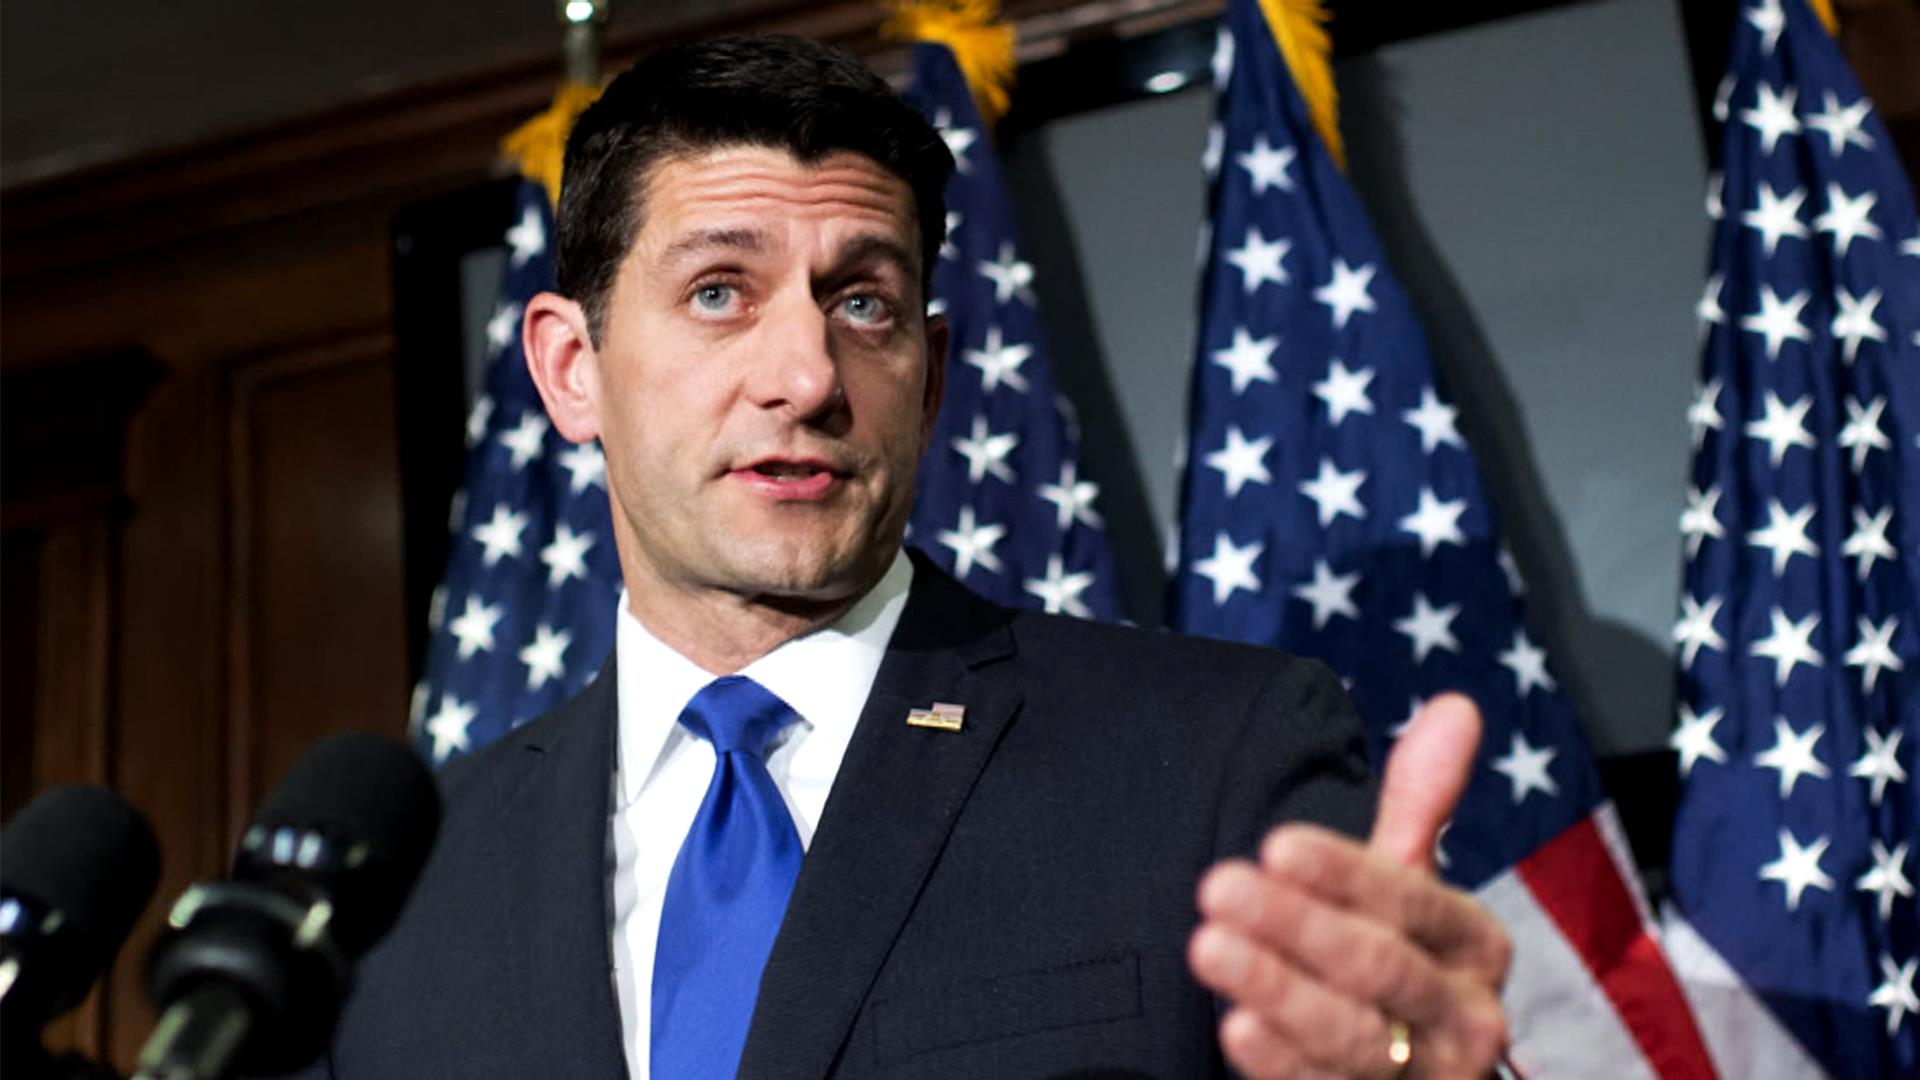 Paul Ryan: I'm 'Not Ready' to Endorse Donald Trump